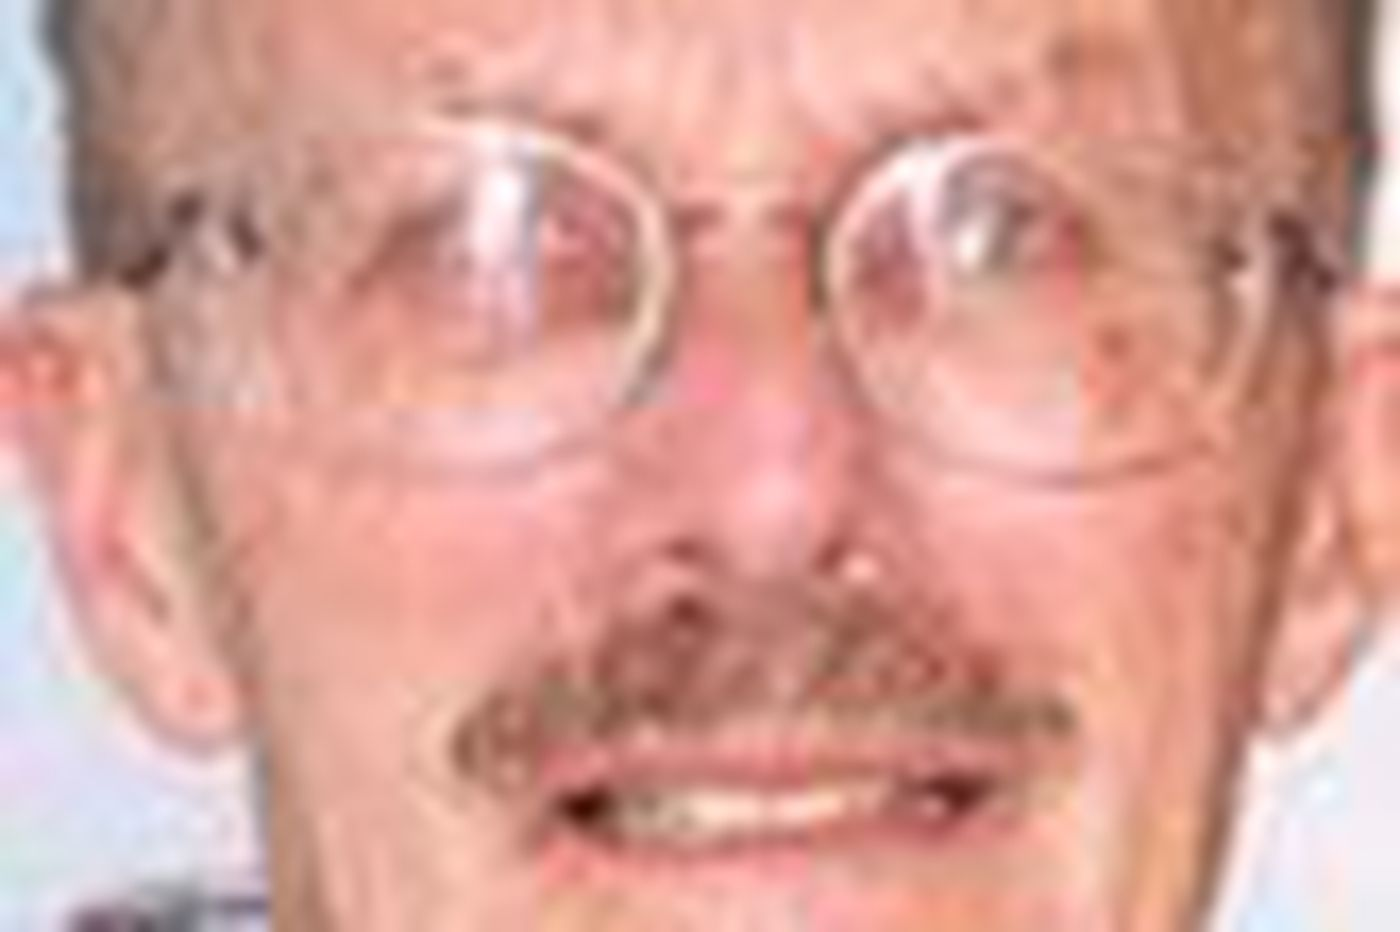 David J. Rietz | Architect, 69